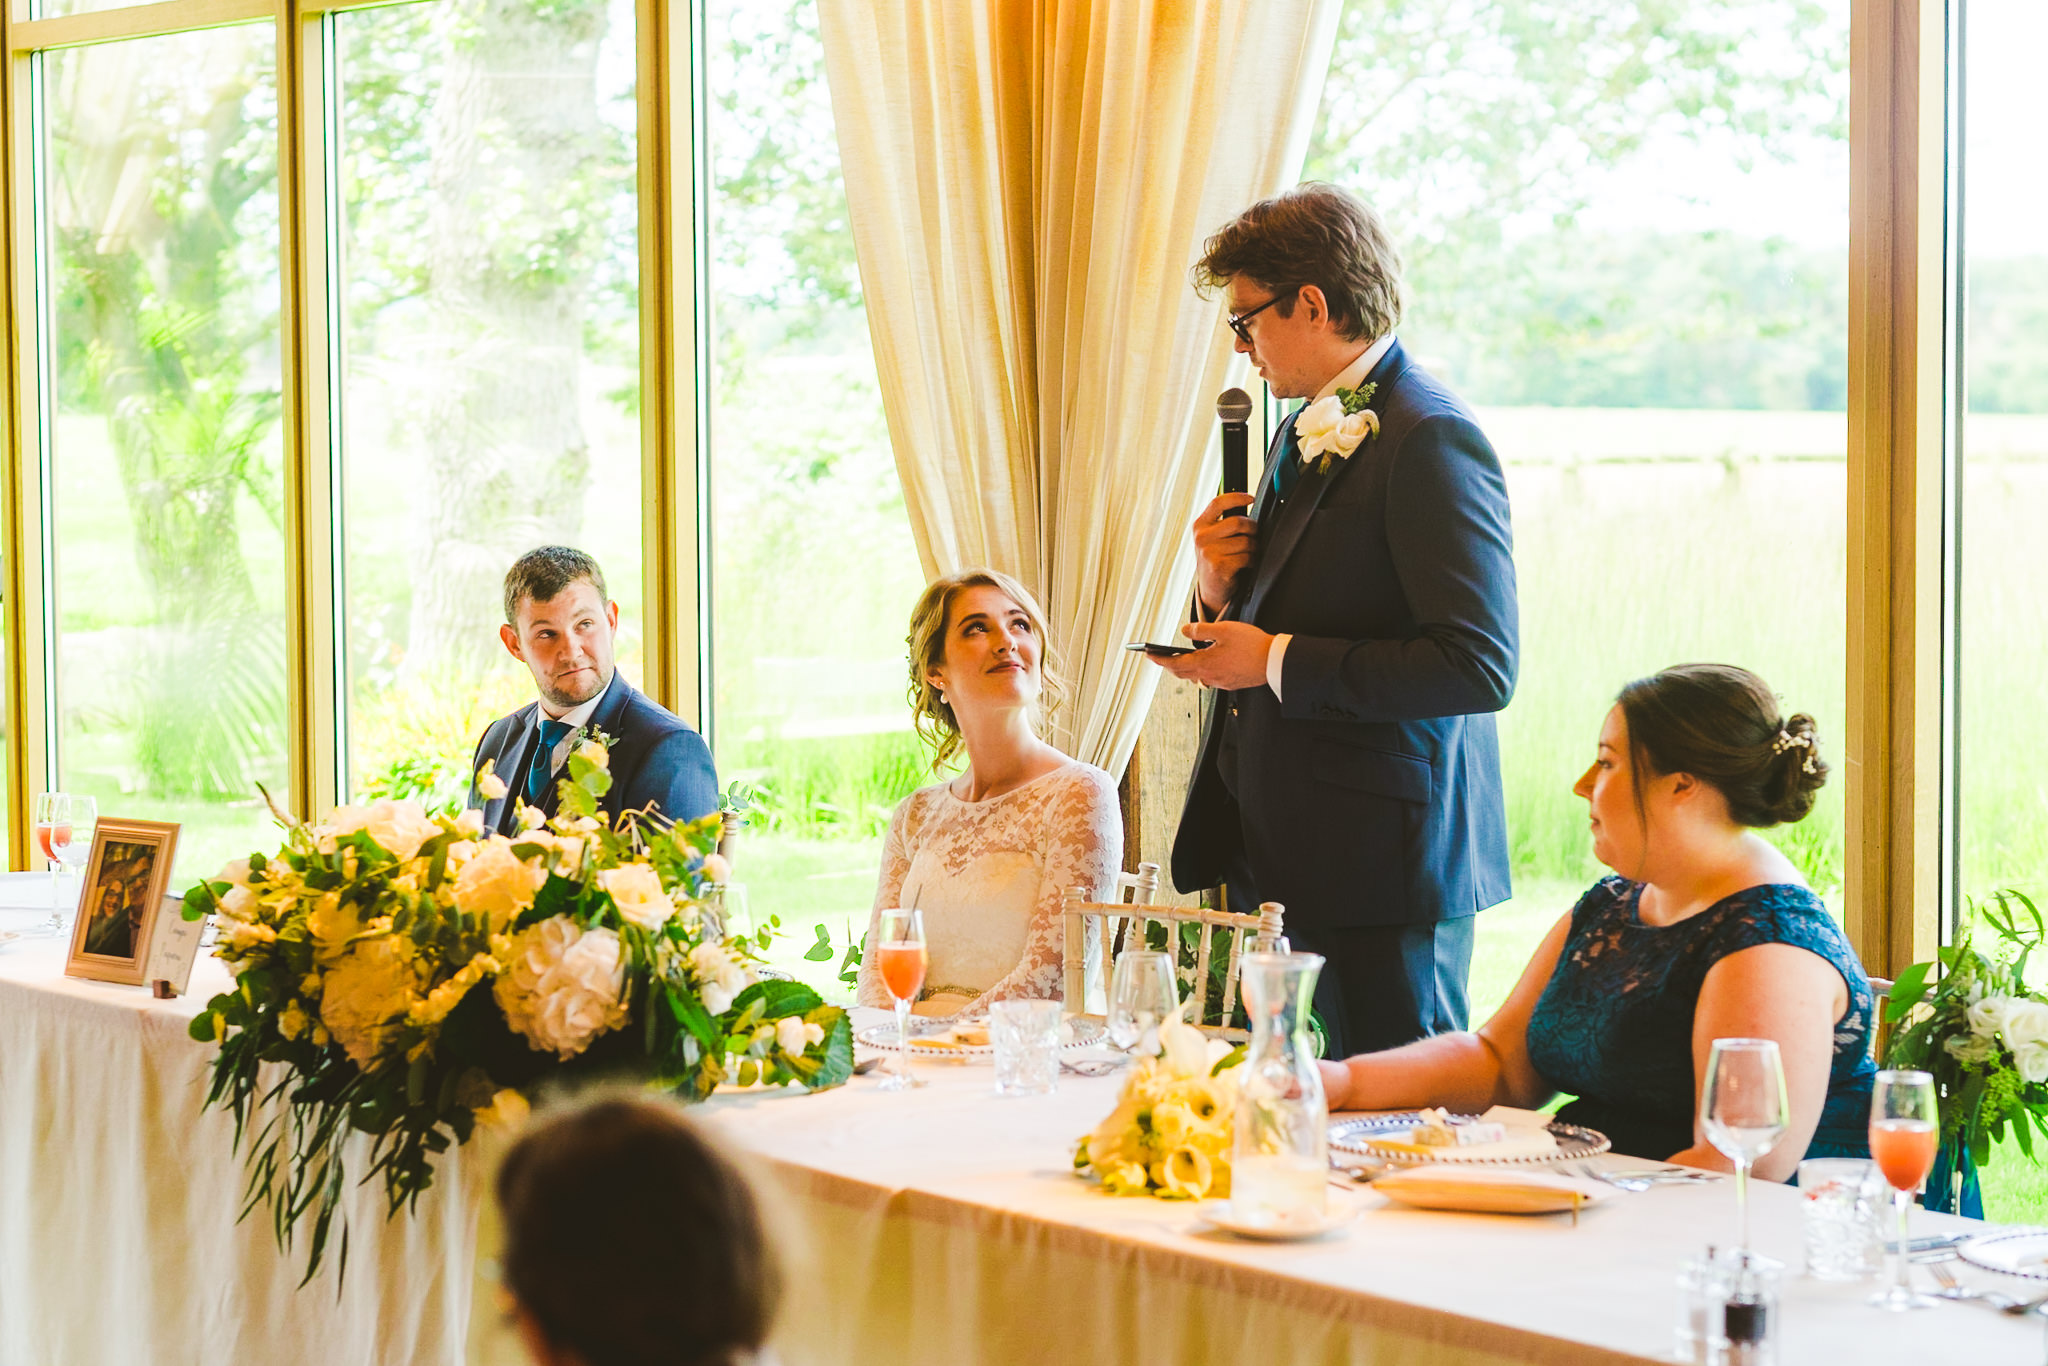 Groom speaks to bride during wedding speech